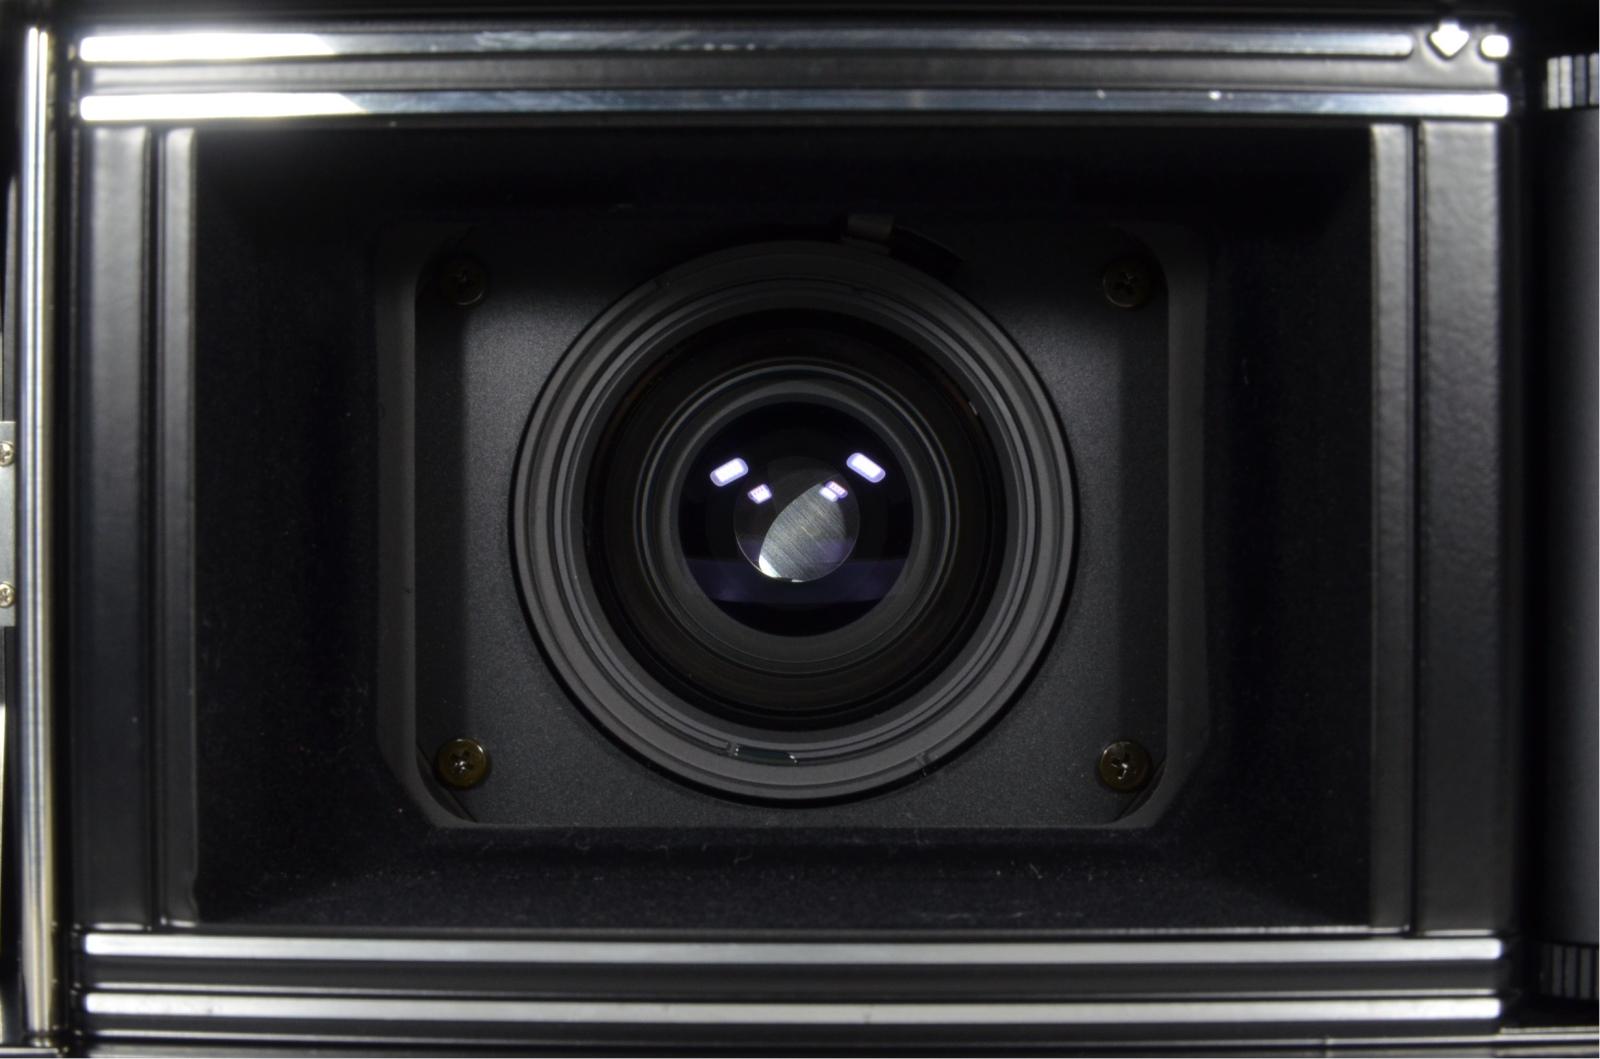 fuji fujifilm gsw690iii professional ebc 65mm f5.6 count '171'